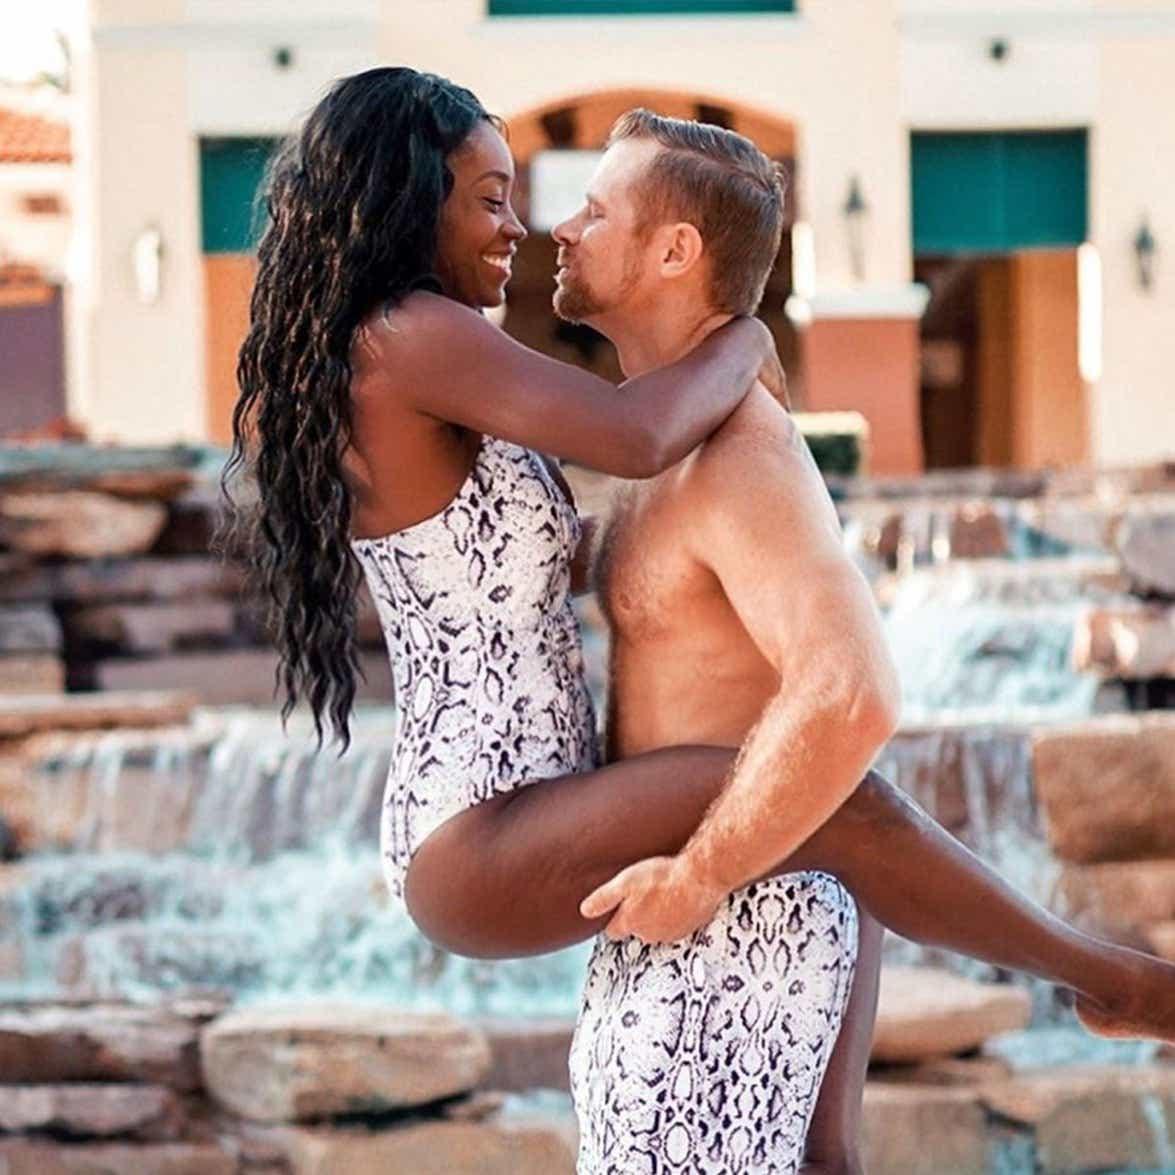 Kevin holding Sally up at the Orange Lake Resort pool